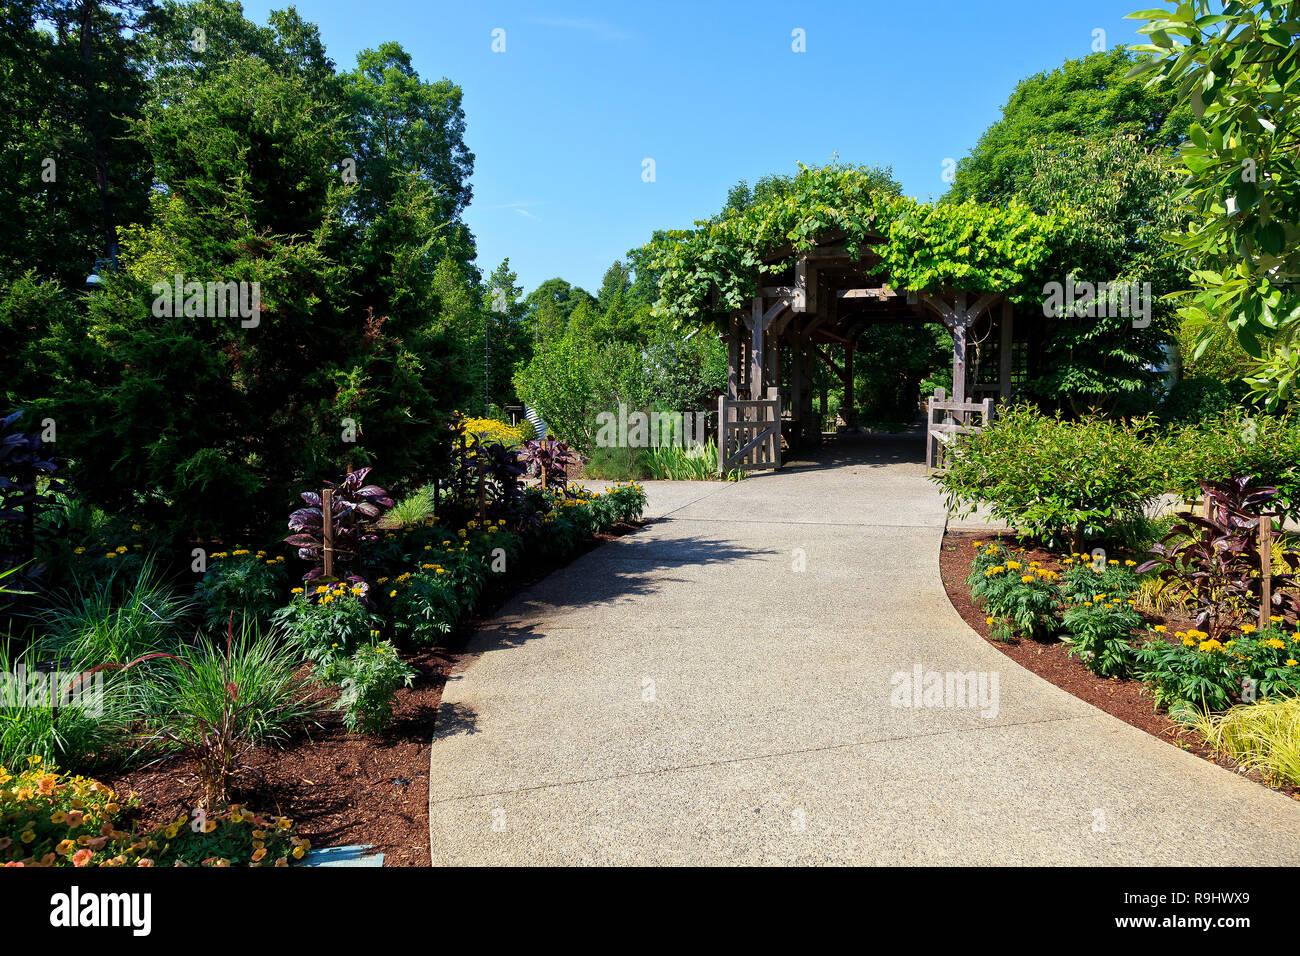 North Carolina Arboretum Garden Entrance in Asheville - Stock Image